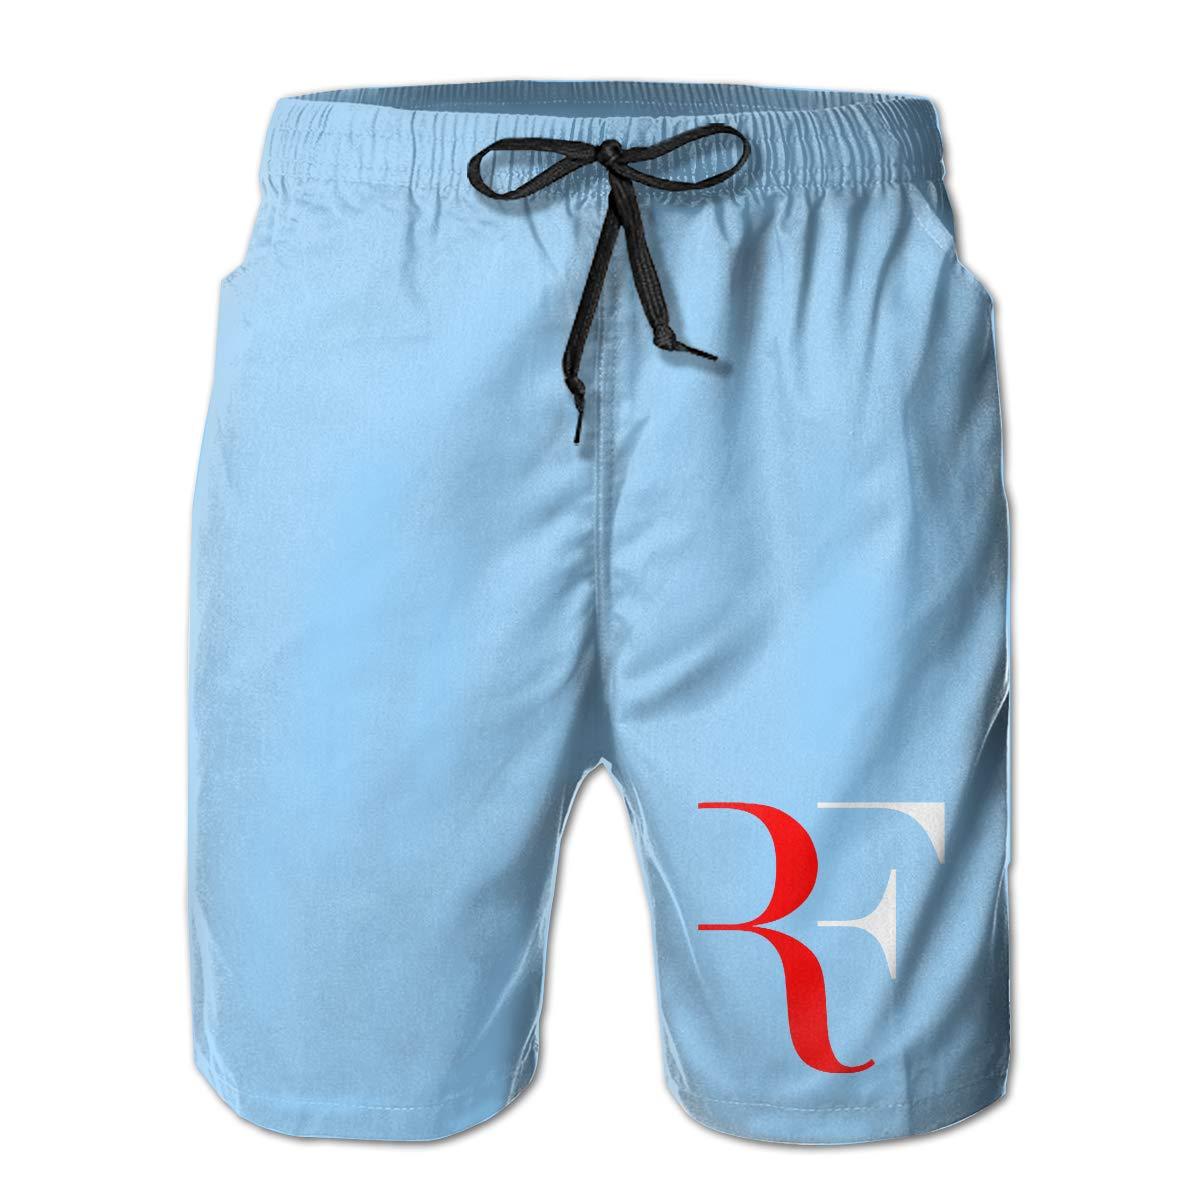 SheSylvi Mens Swim Trunks Roger-Federer Accessories Swimming Beach Surfing Board Shorts Swimwear with Pockets